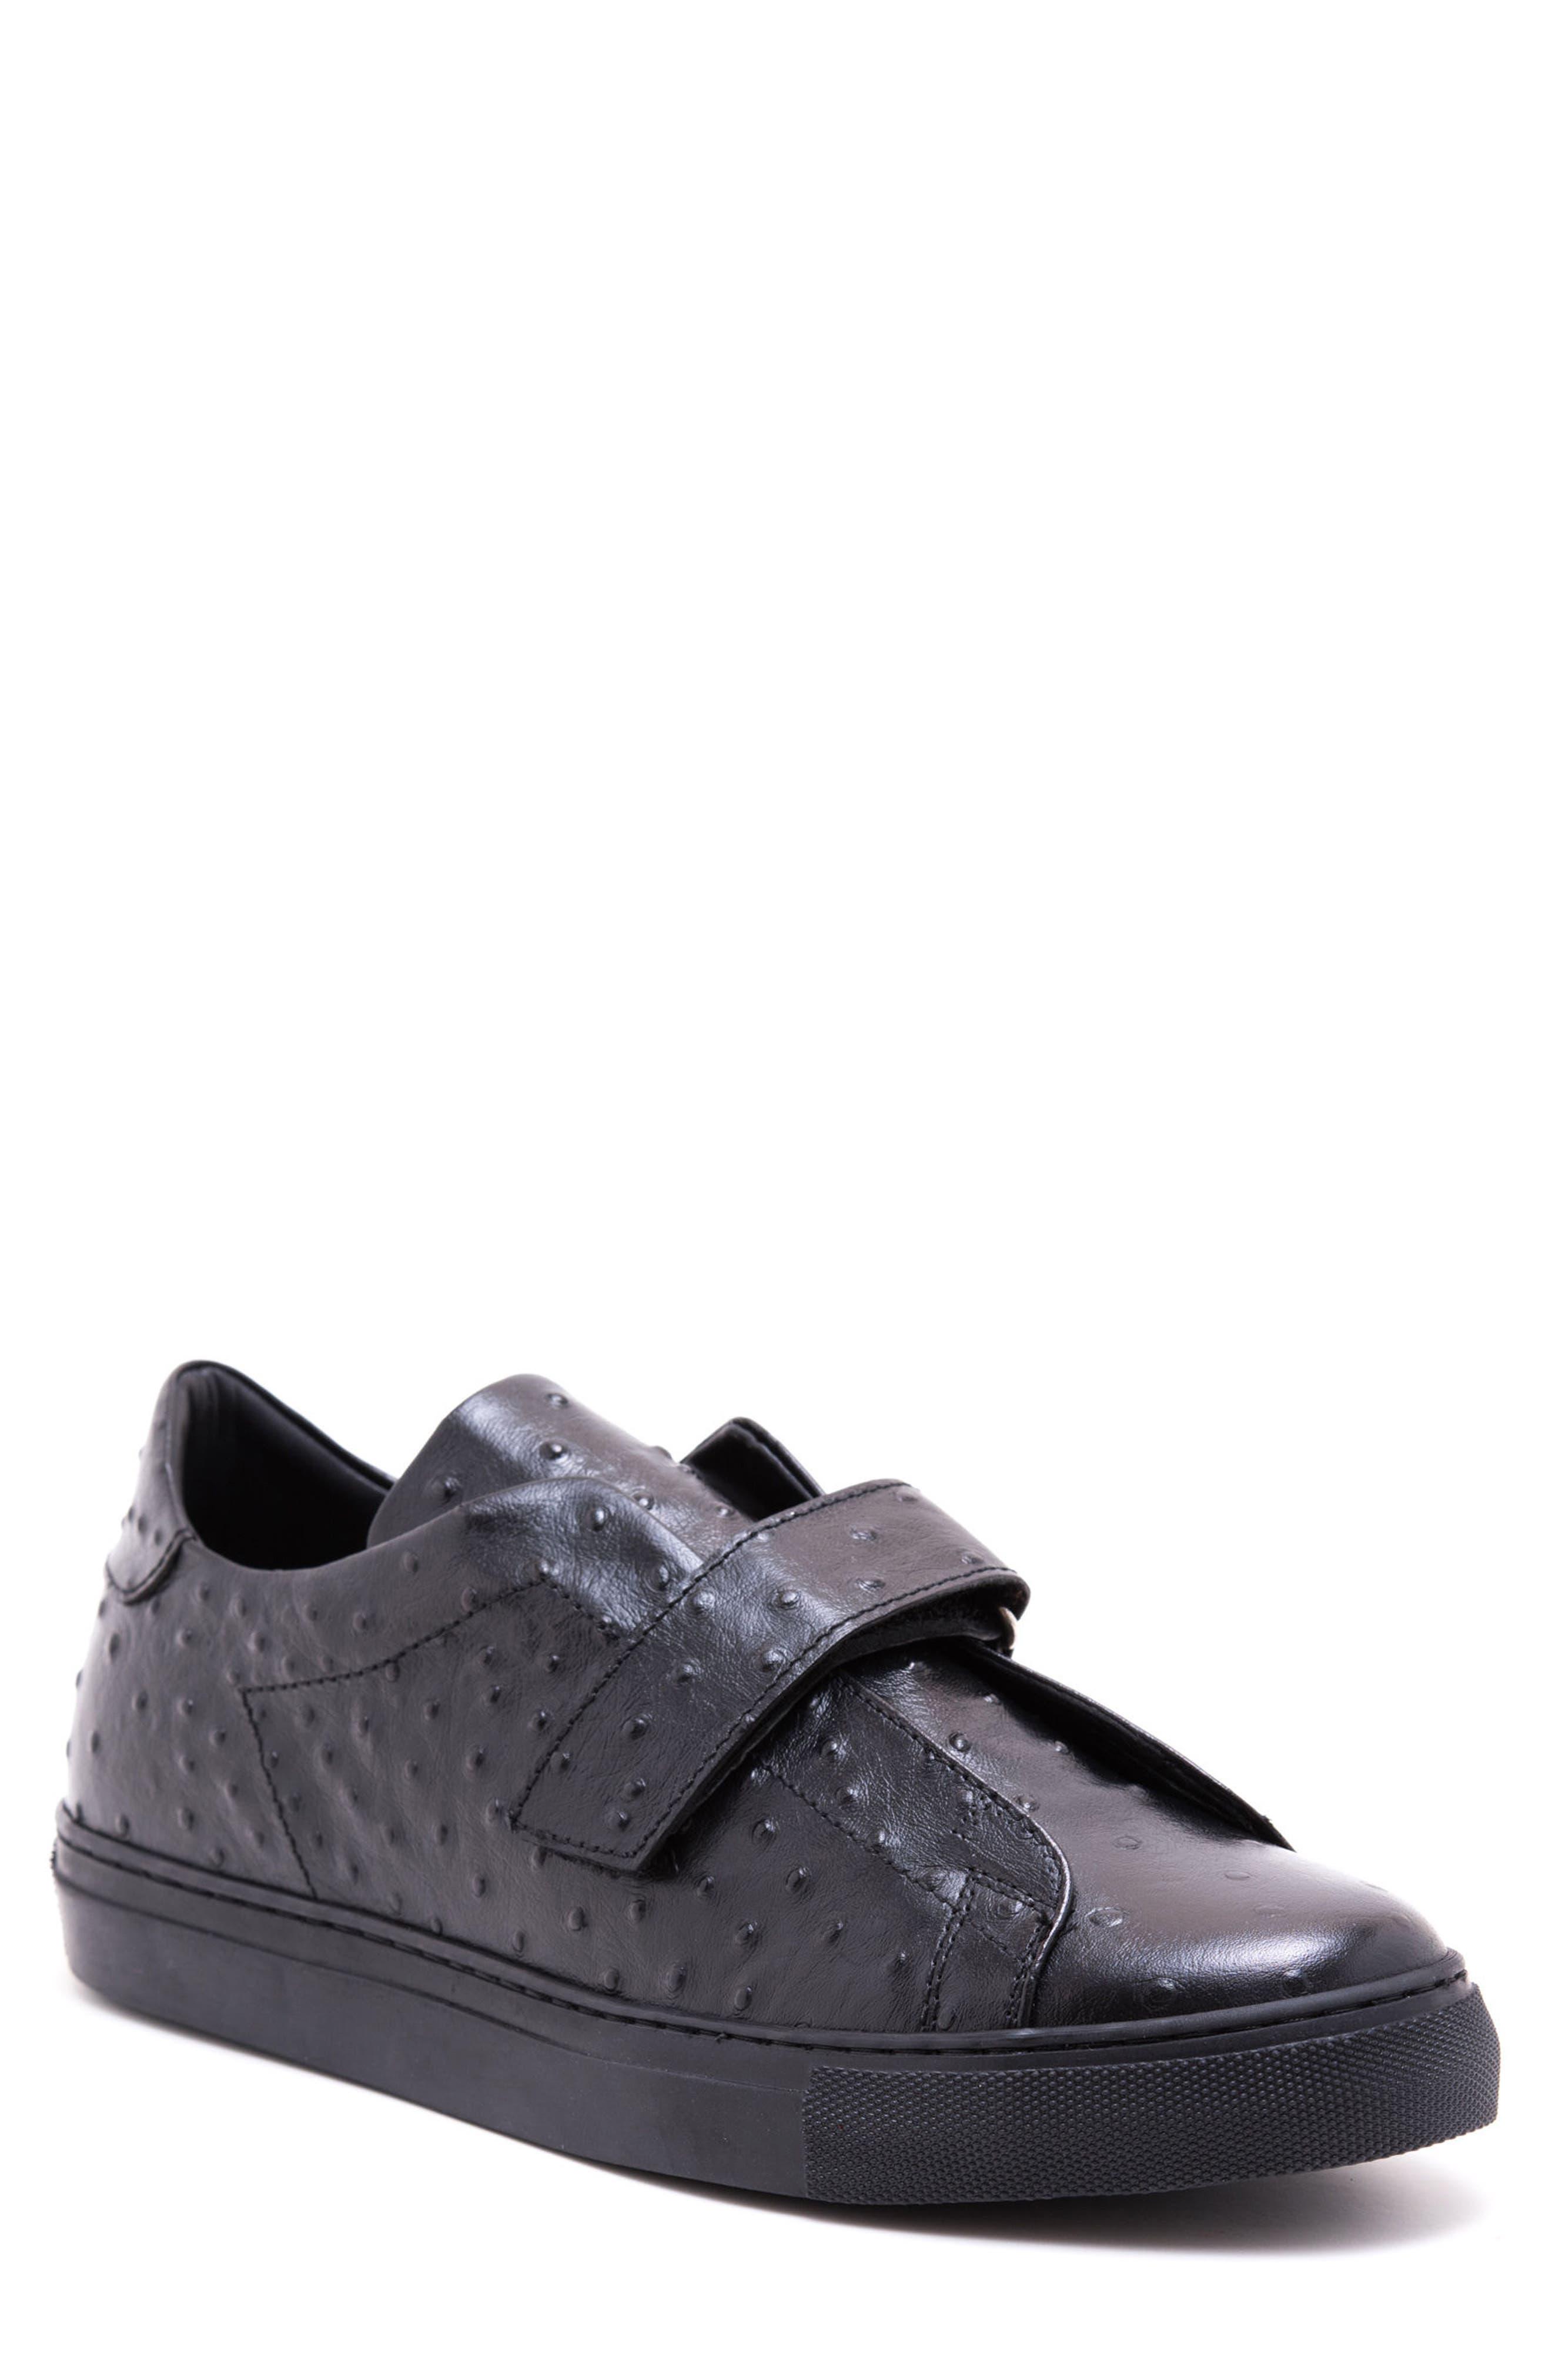 West Sneaker,                         Main,                         color, BLACK